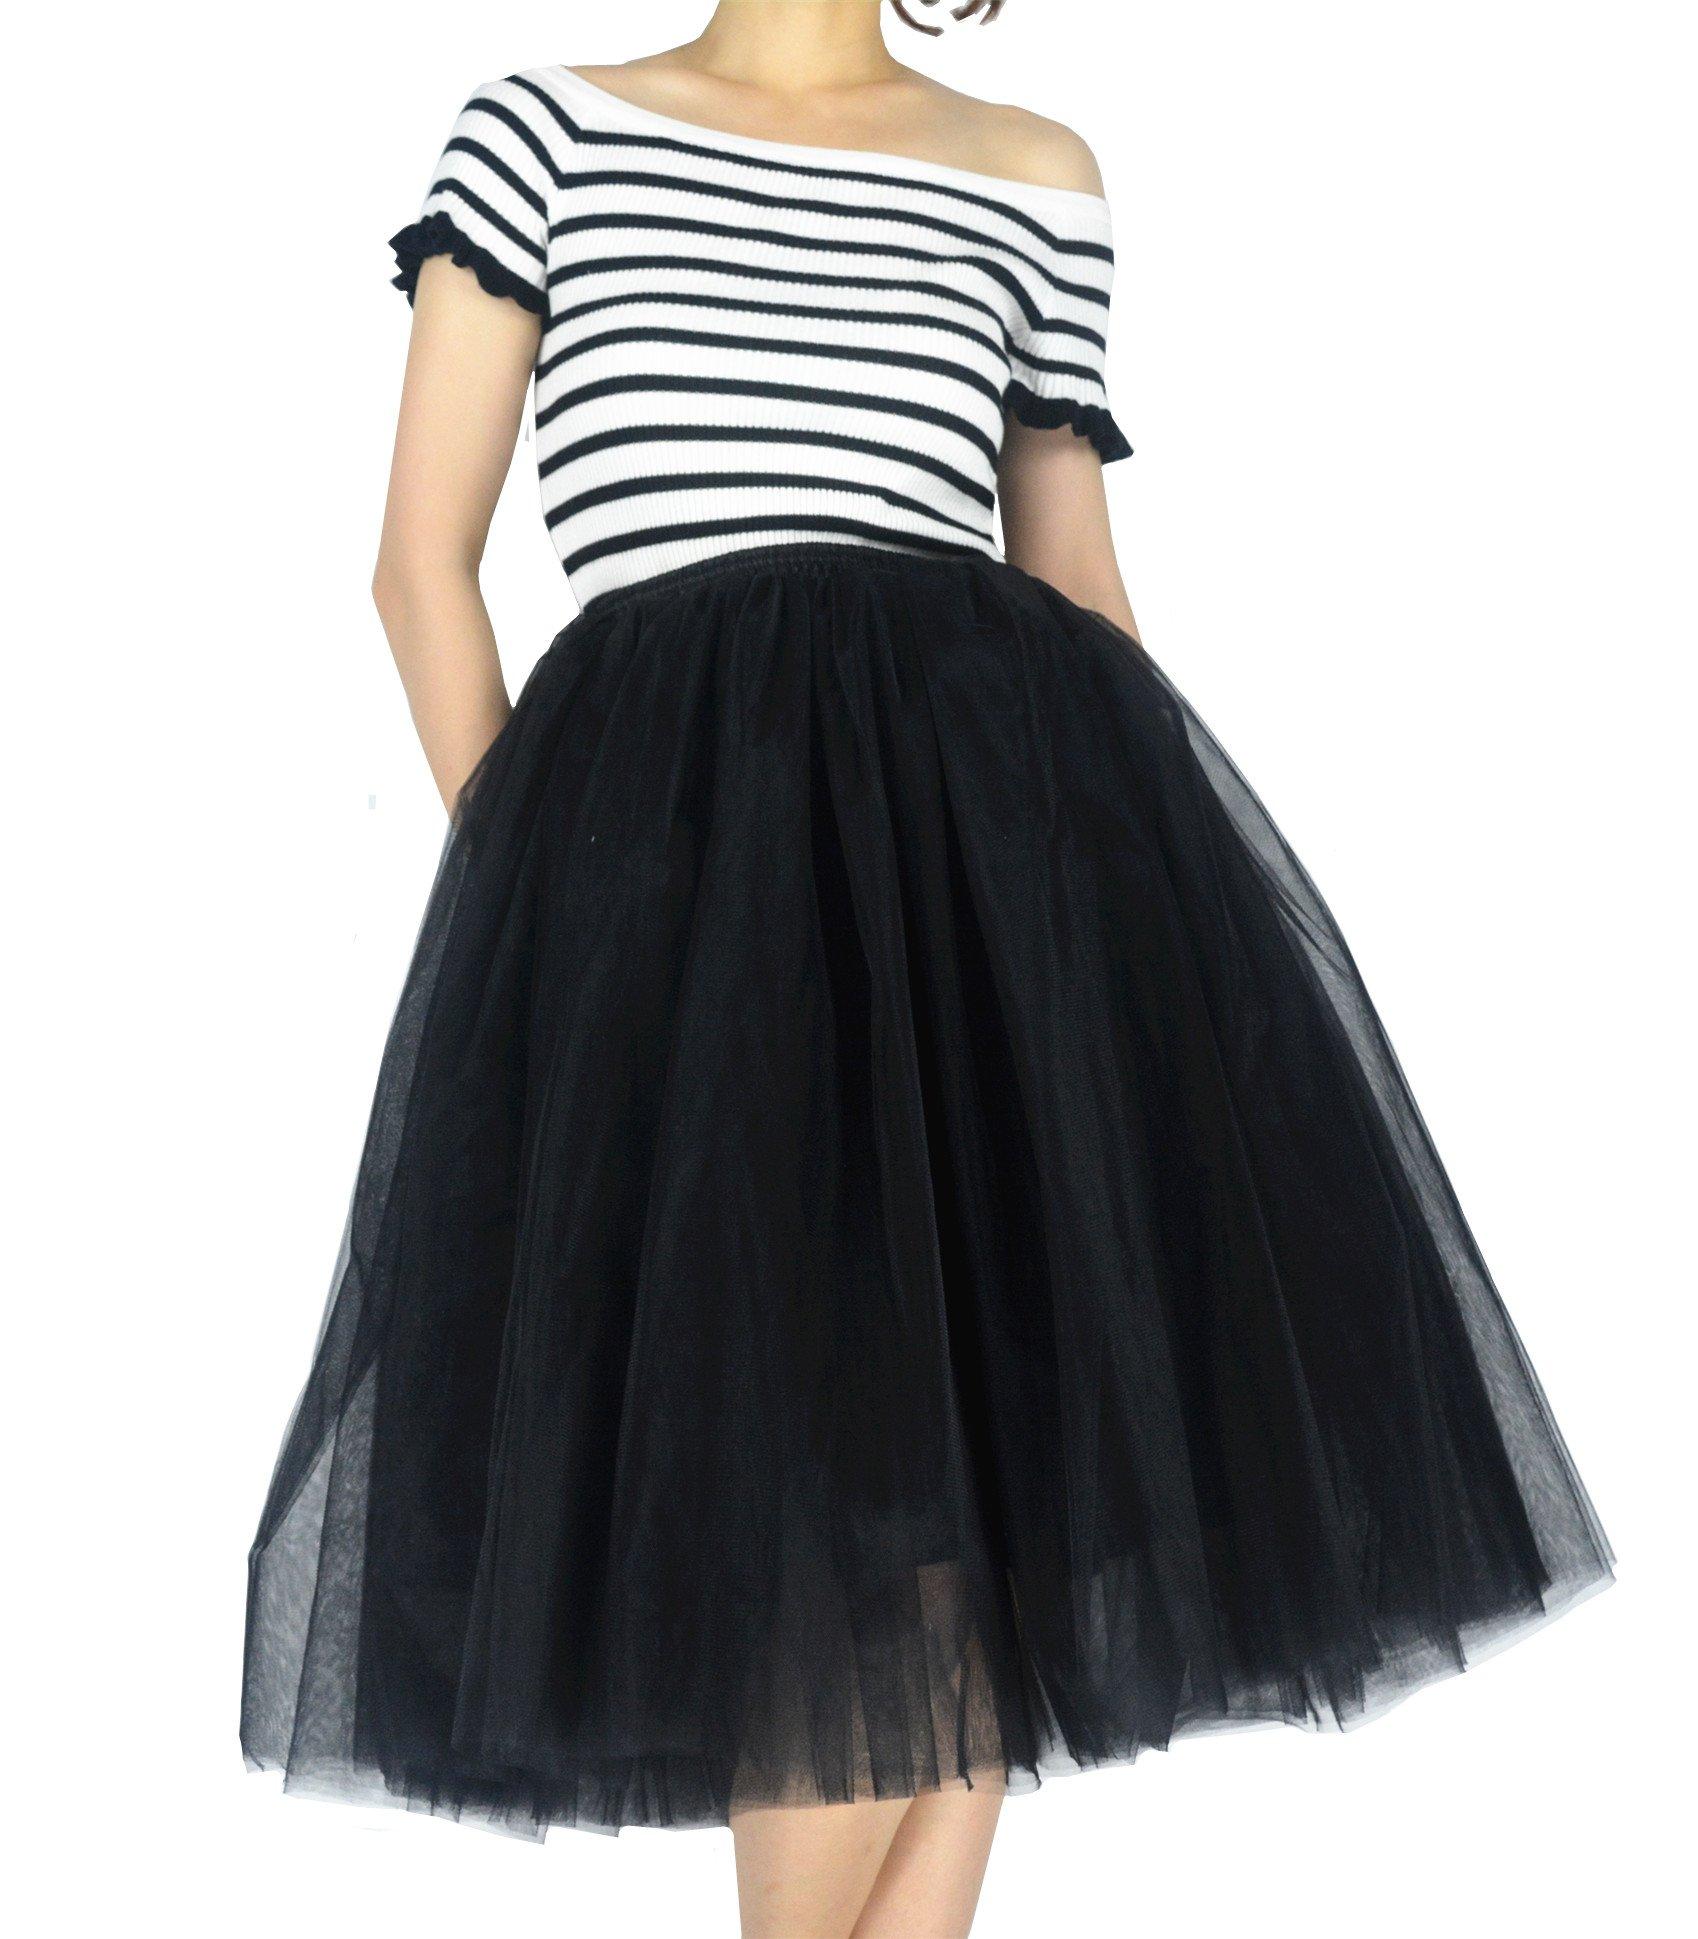 YSJERA Women's Layered Adult Tutu Tulle Midi/Knee Length A Line Prom Party Skirt Petticoat (L, Black)